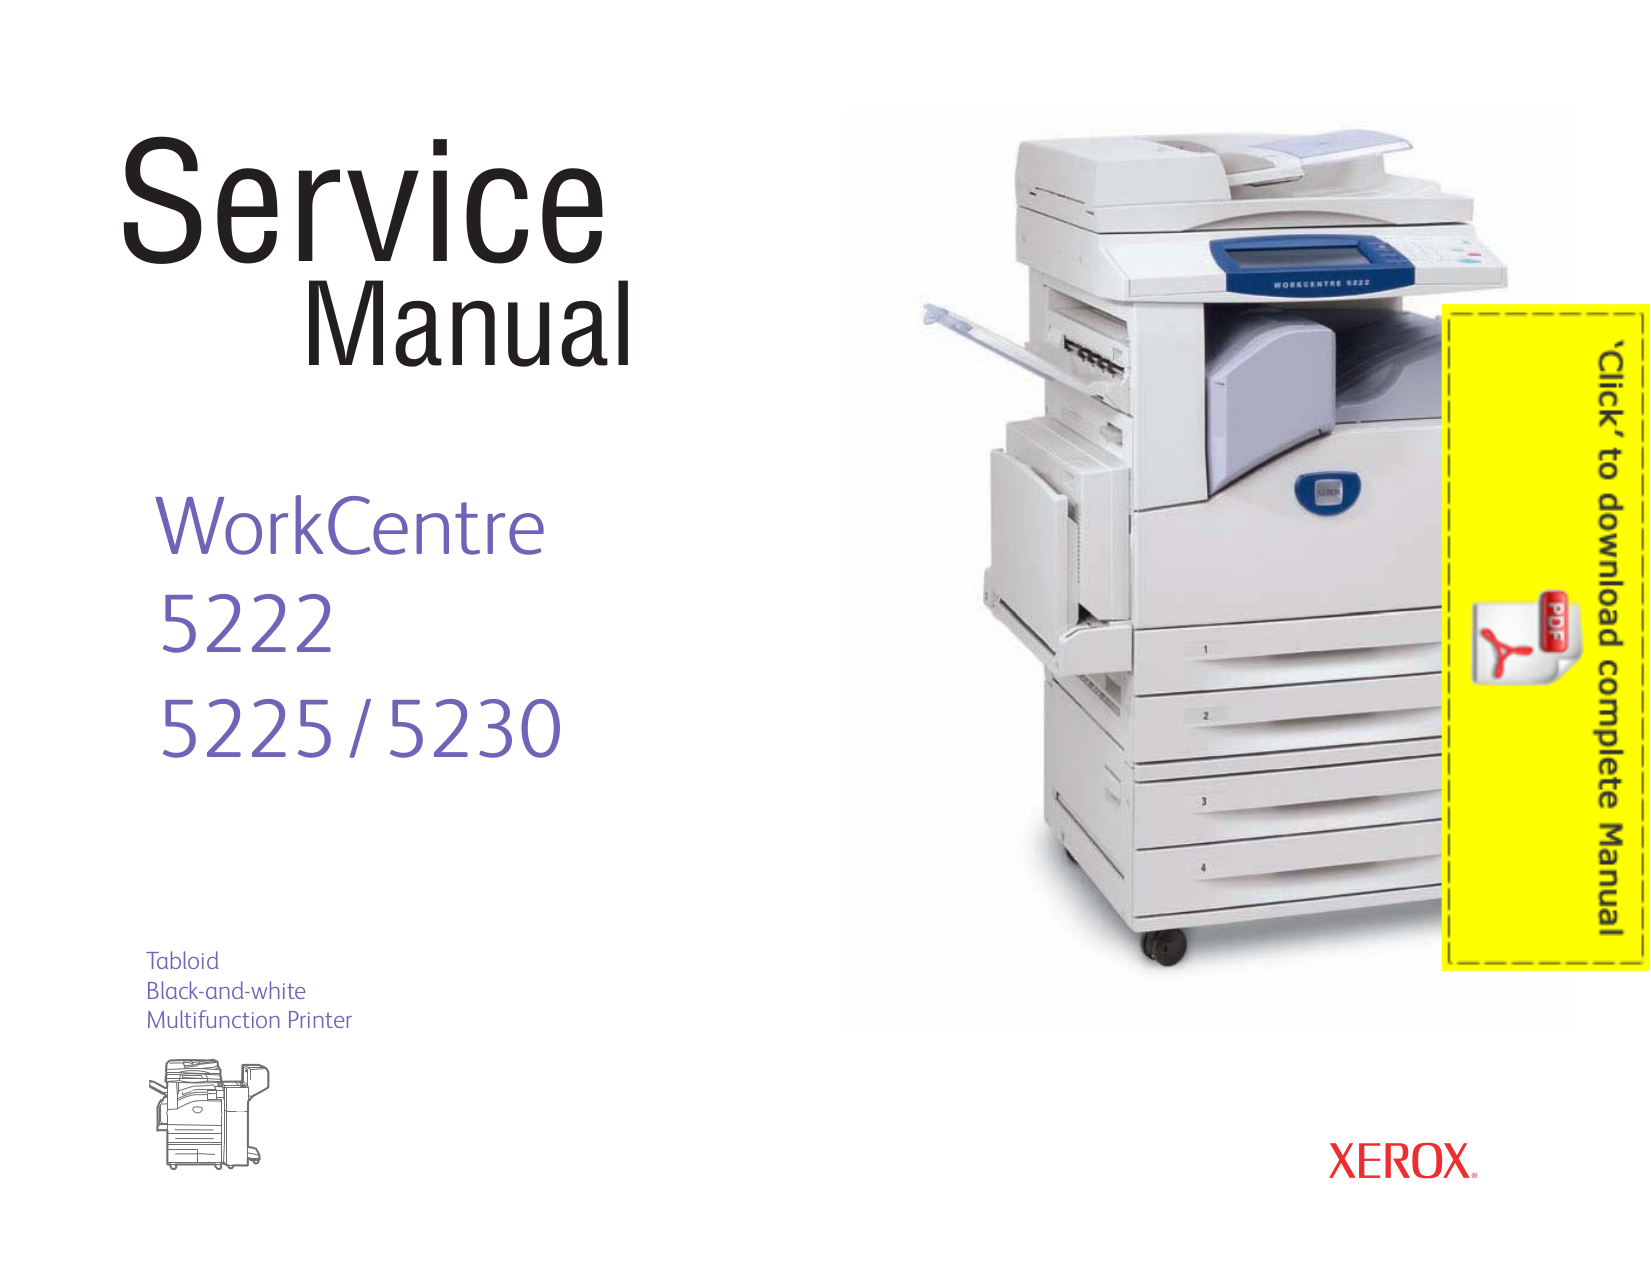 pdf manual for xerox multifunction printer workcentre pro 421 rh umlib com xerox workcentre 5230 manuel xerox wc 5230 manual